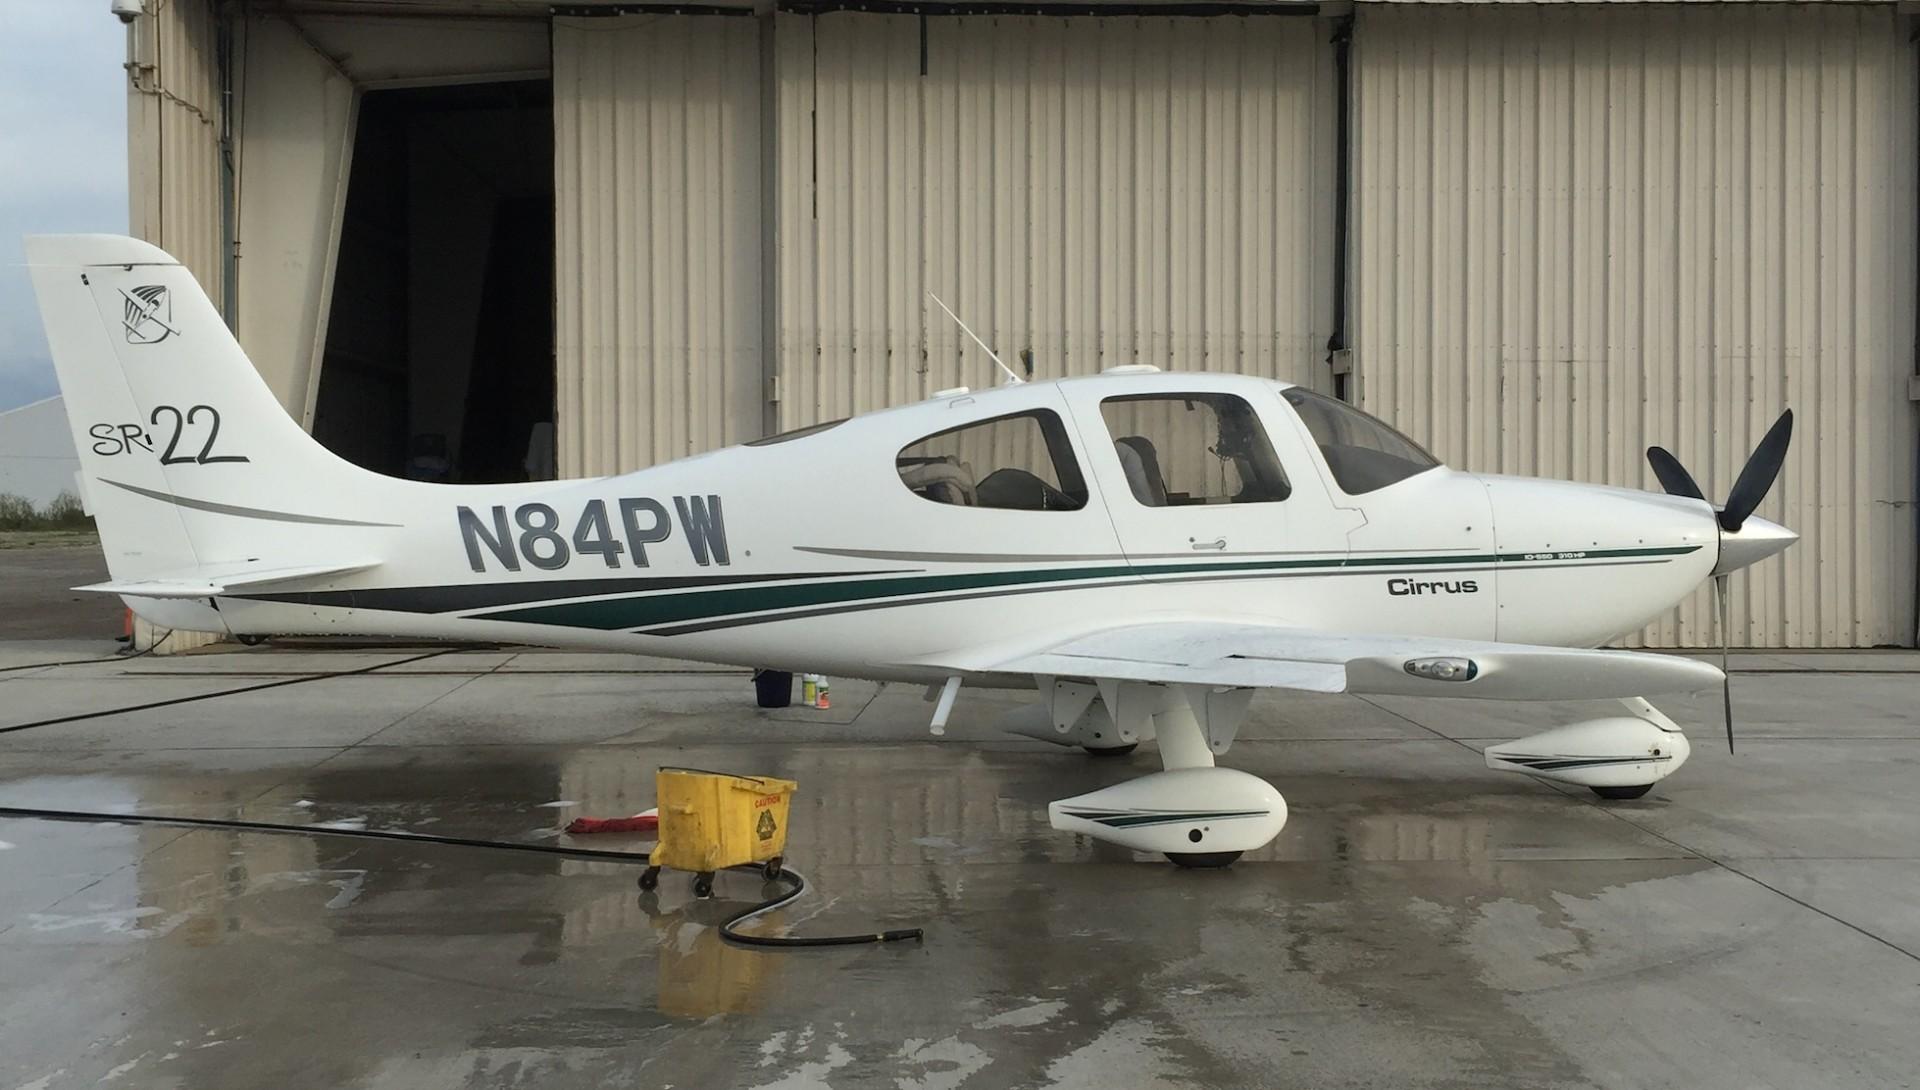 Sale pending! Cirrus SR22 570 Since G&N overhaul